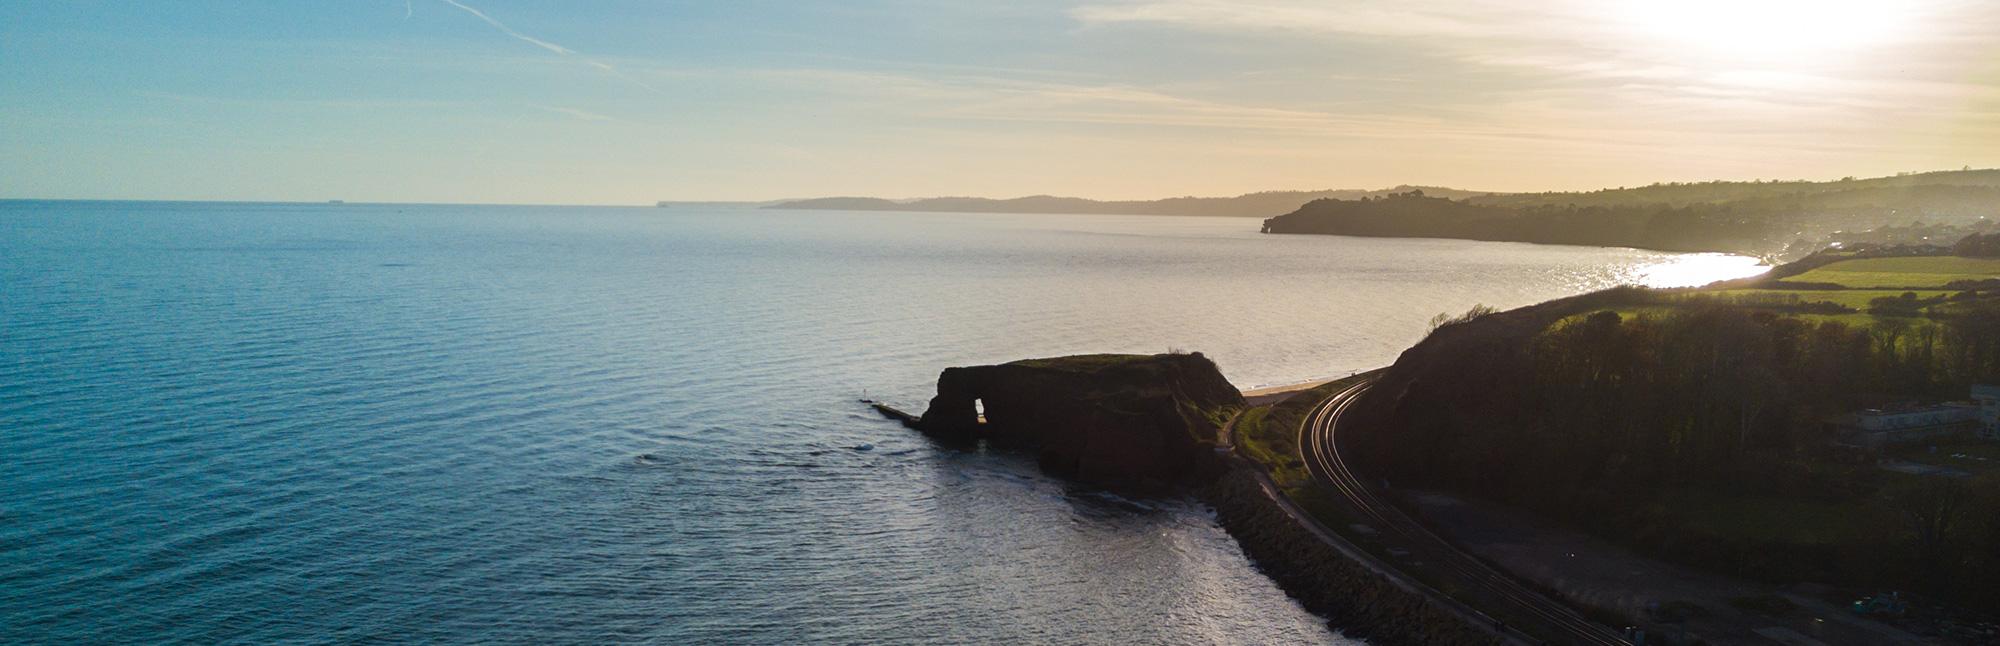 Dawlish Aerial Shot Of Bay